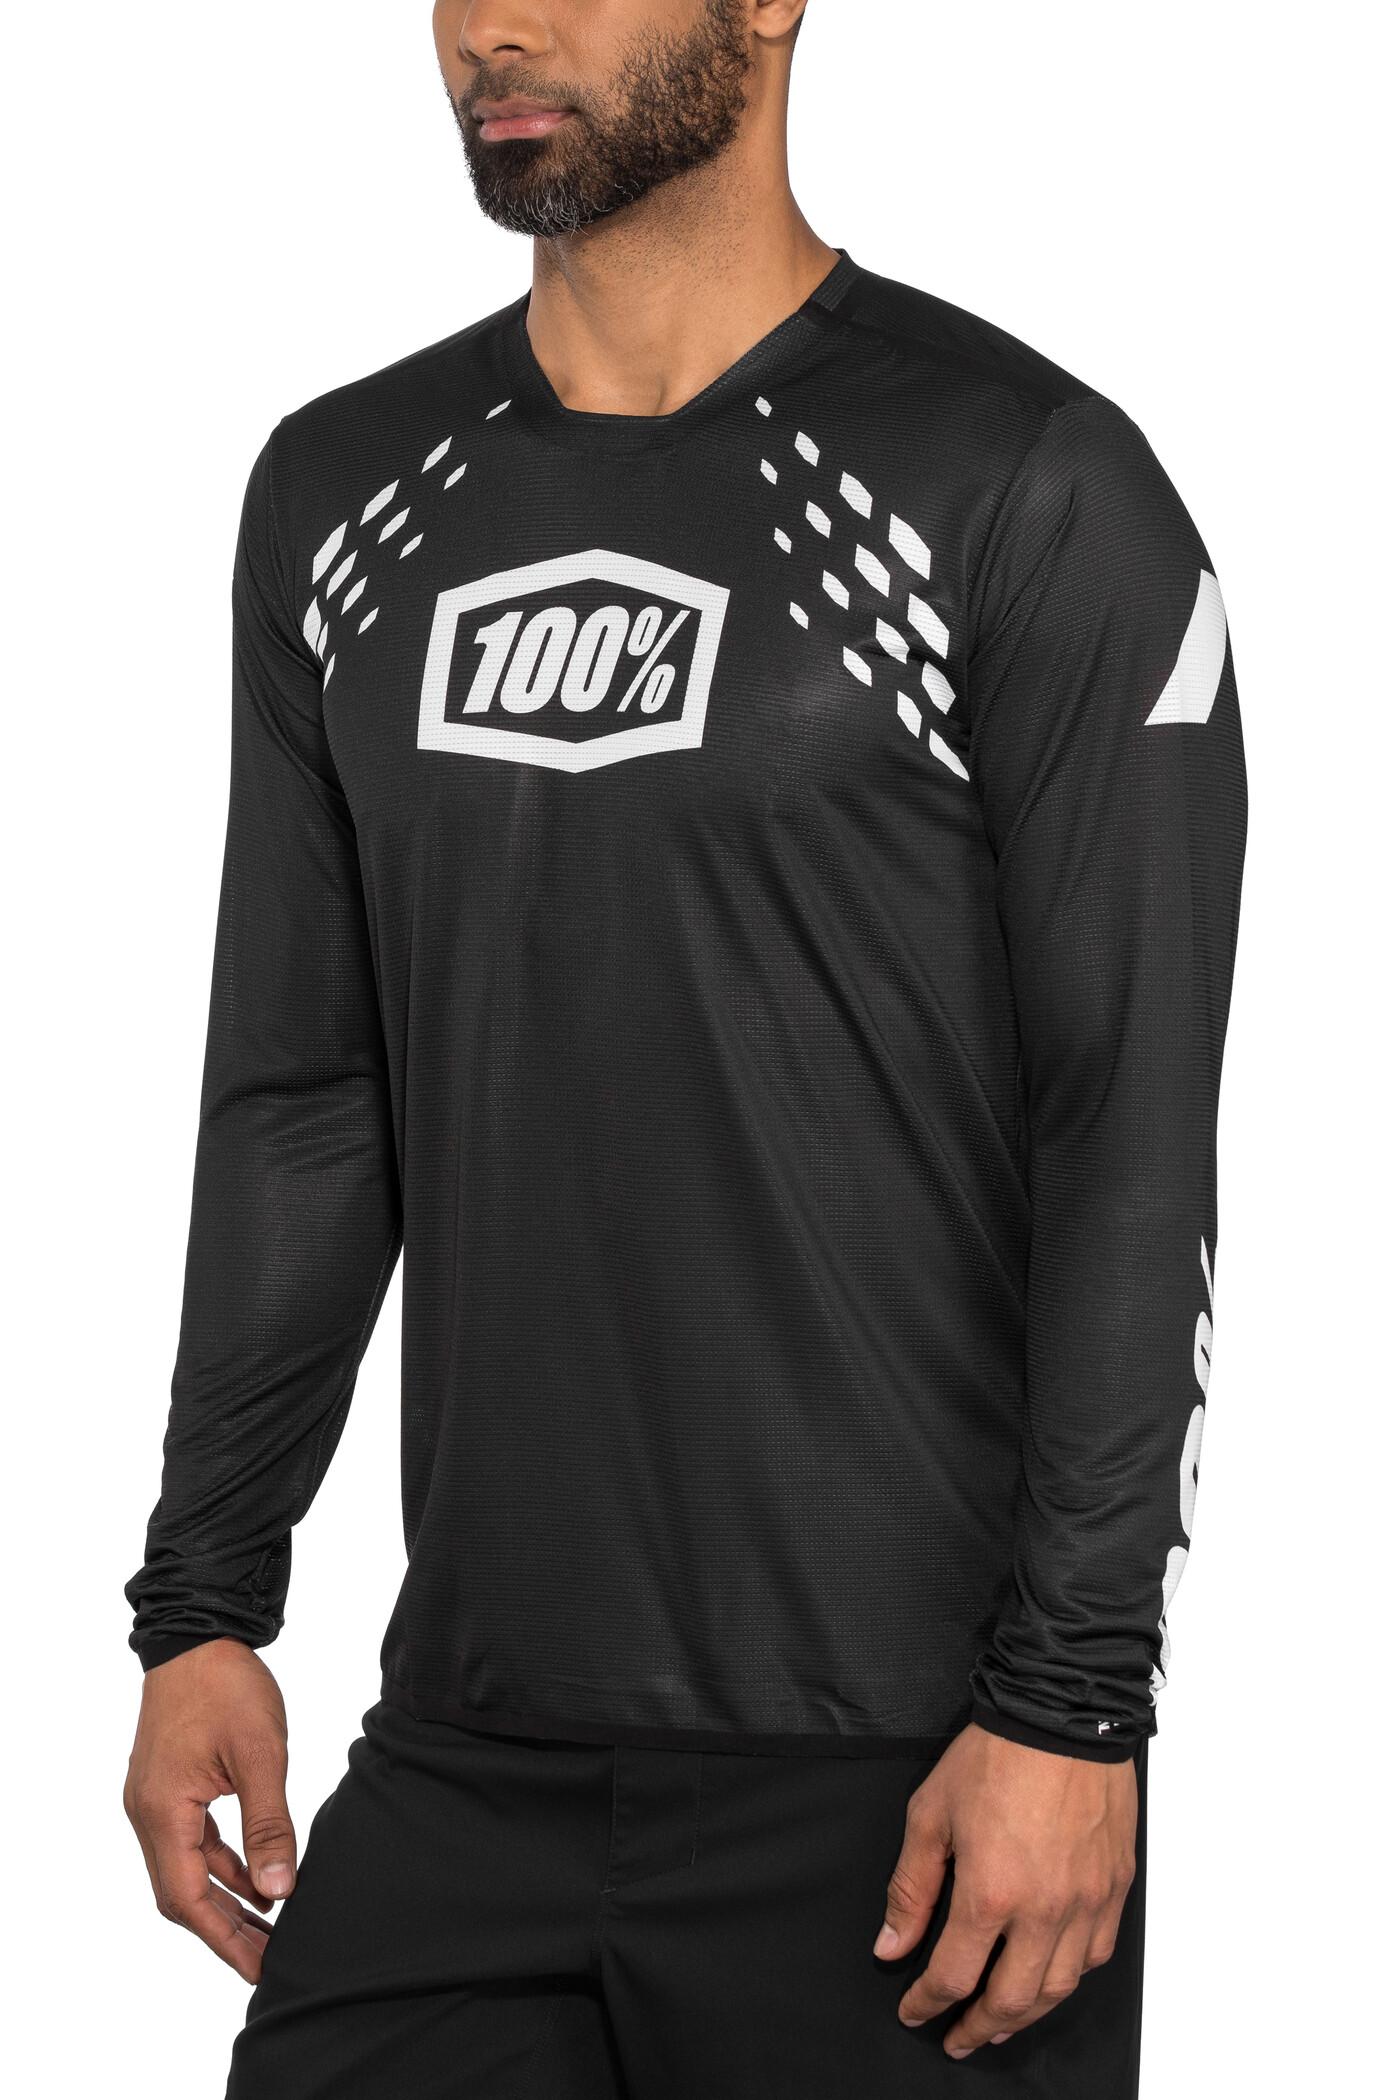 100% R-Core-X DH Langærmet cykeltrøje Herrer, black | Trøjer